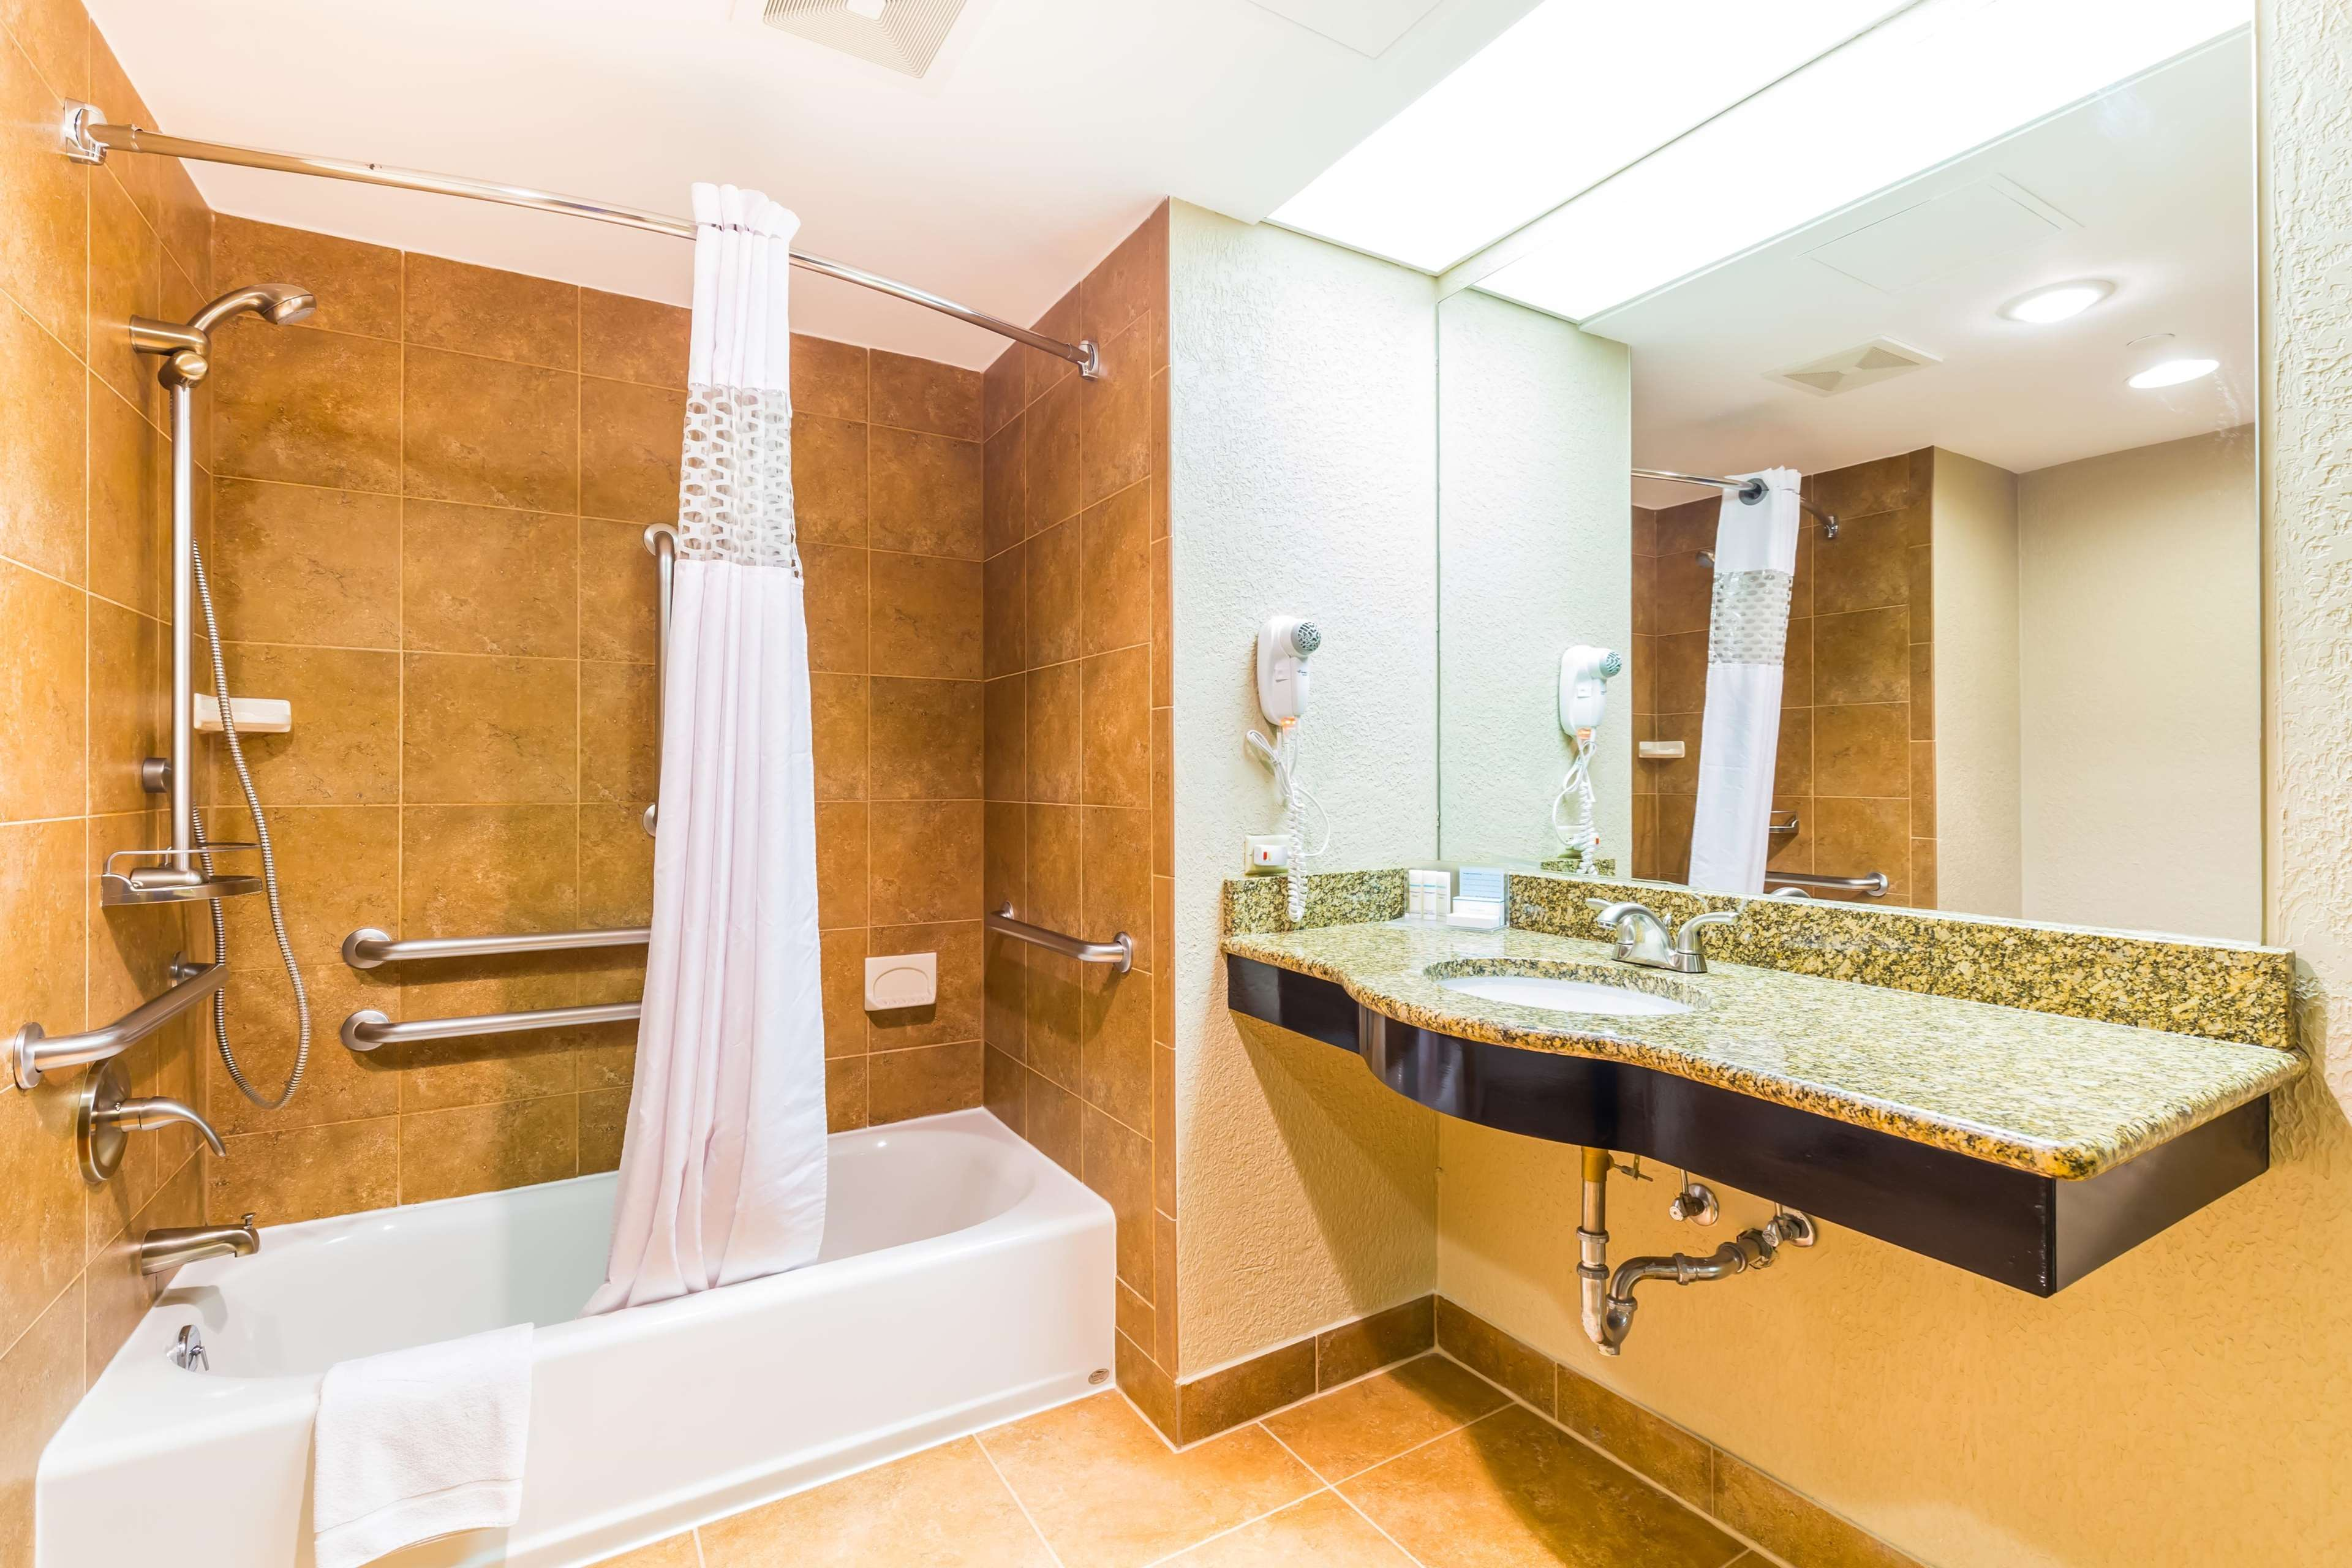 Hampton Inn & Suites Chicago/Hoffman Estates image 37